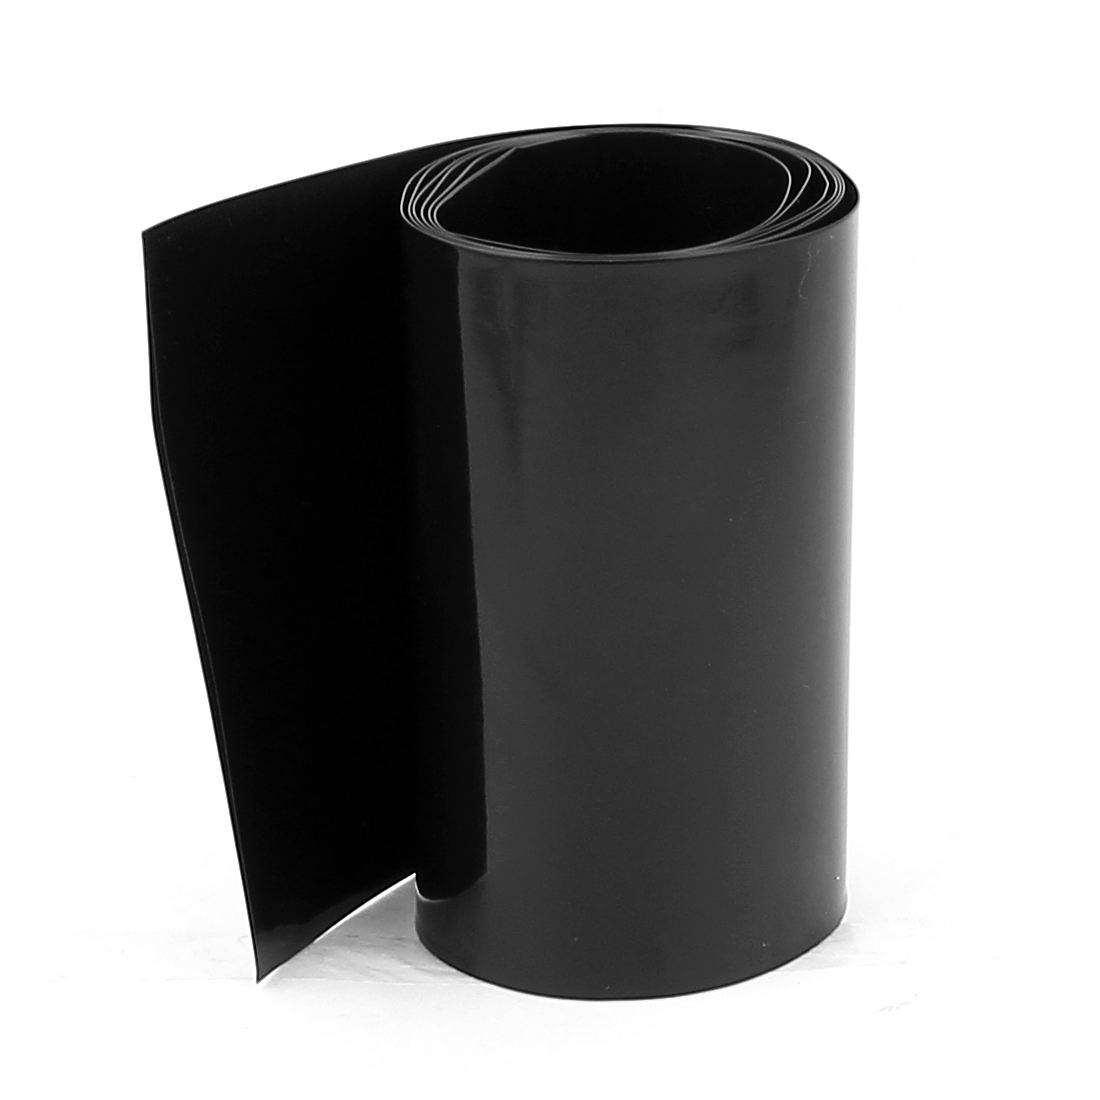 3.3ft 85mm Flat 54mm Dia PVC Heat Shrink Tubing Black for 4 x 18650 Battery